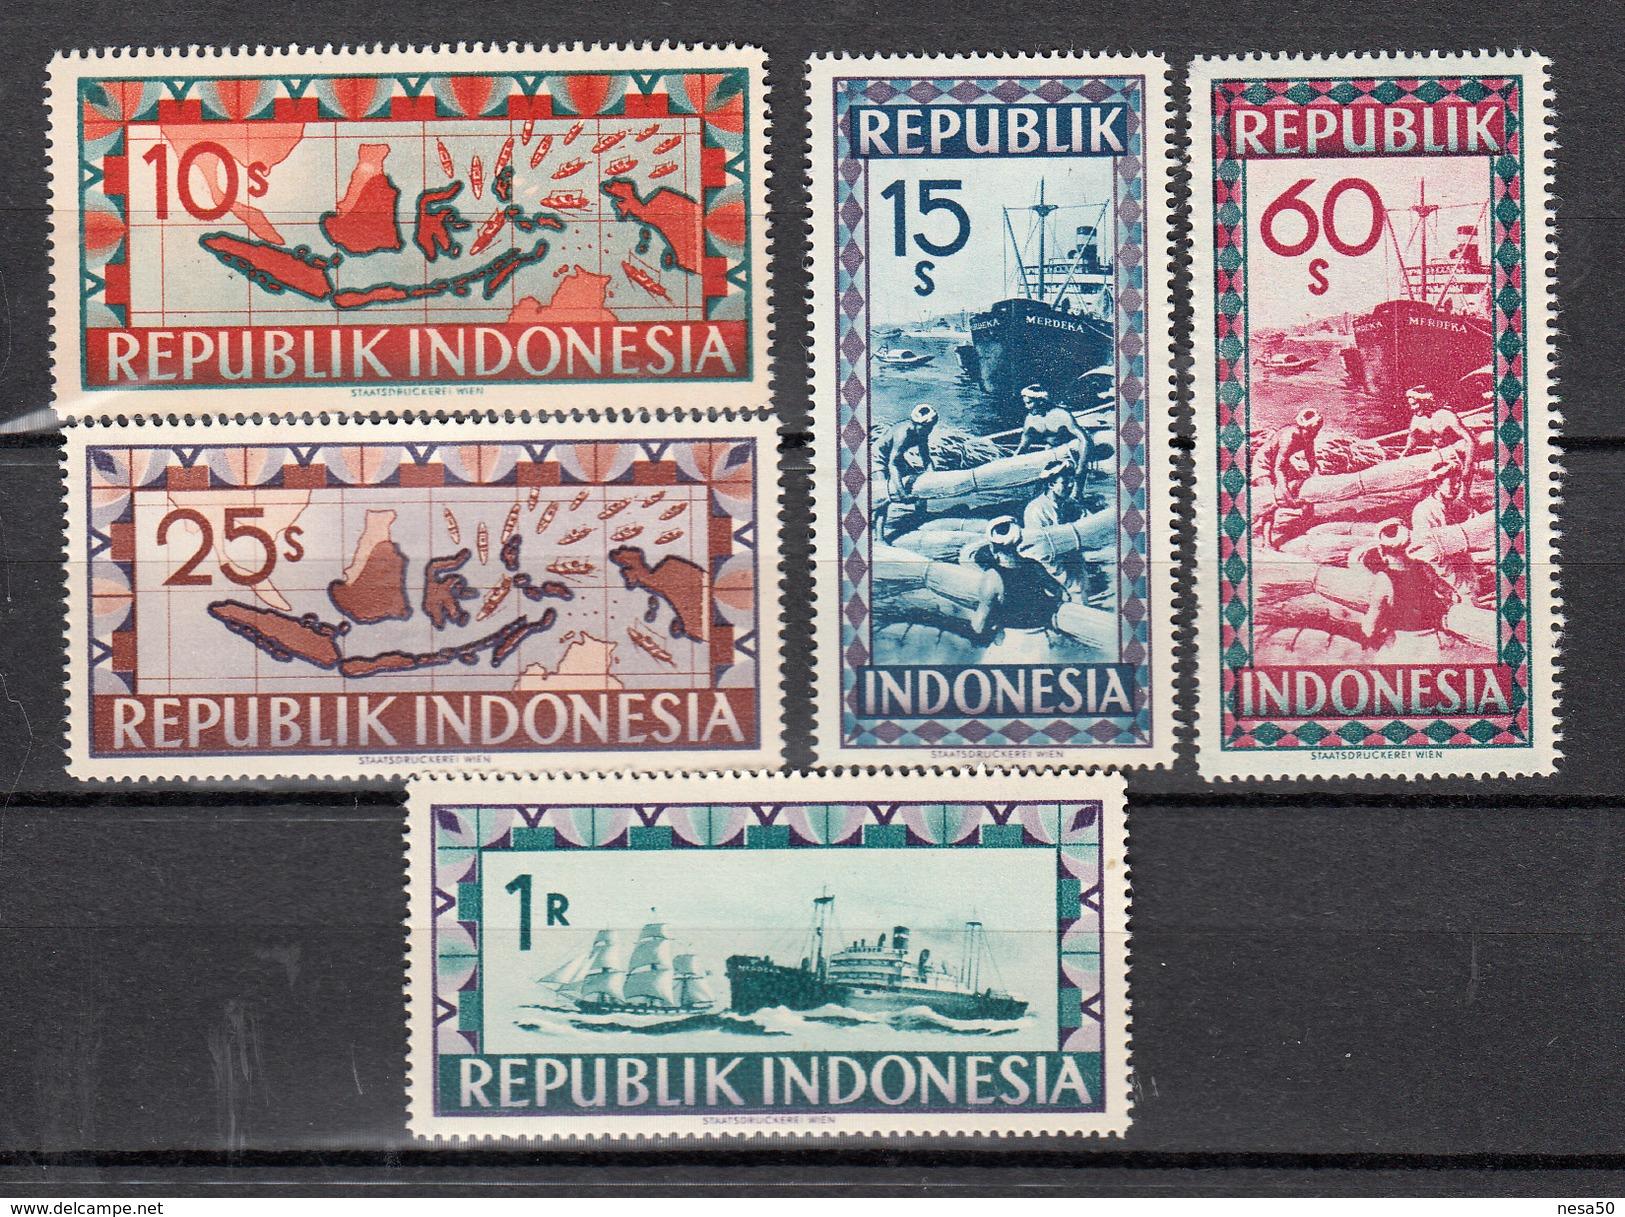 Indonesie, Republik Indonesia   Lokale Uitgaven 1949 Mi Nr 91 - 95 ; Landkaart, Schip, Ship, Zeilschip Postfris - Indonesia